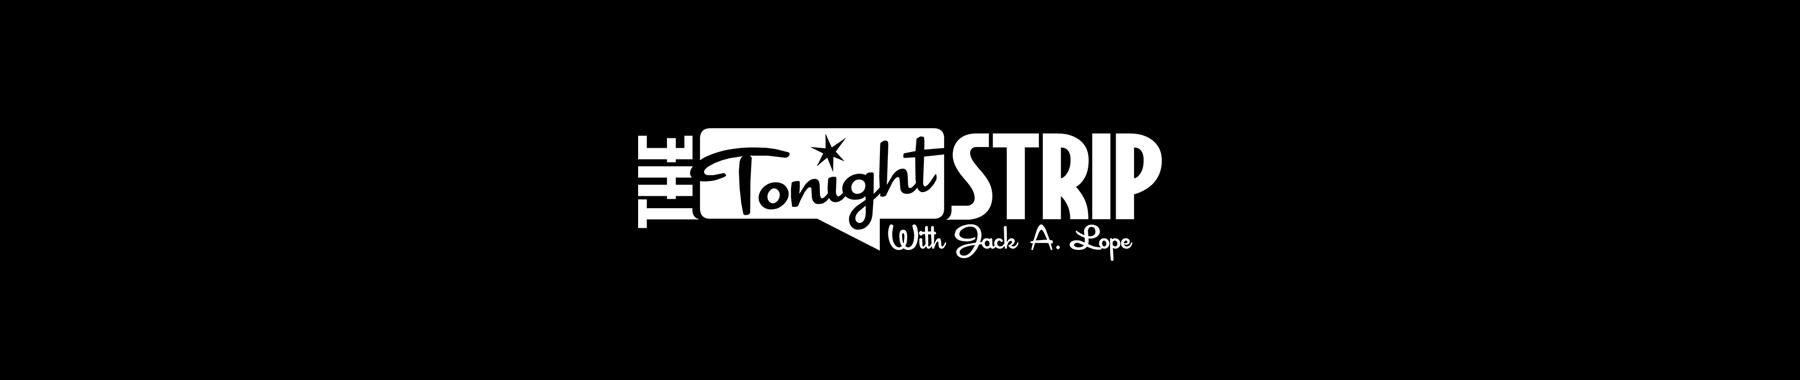 tonight strip.jpg